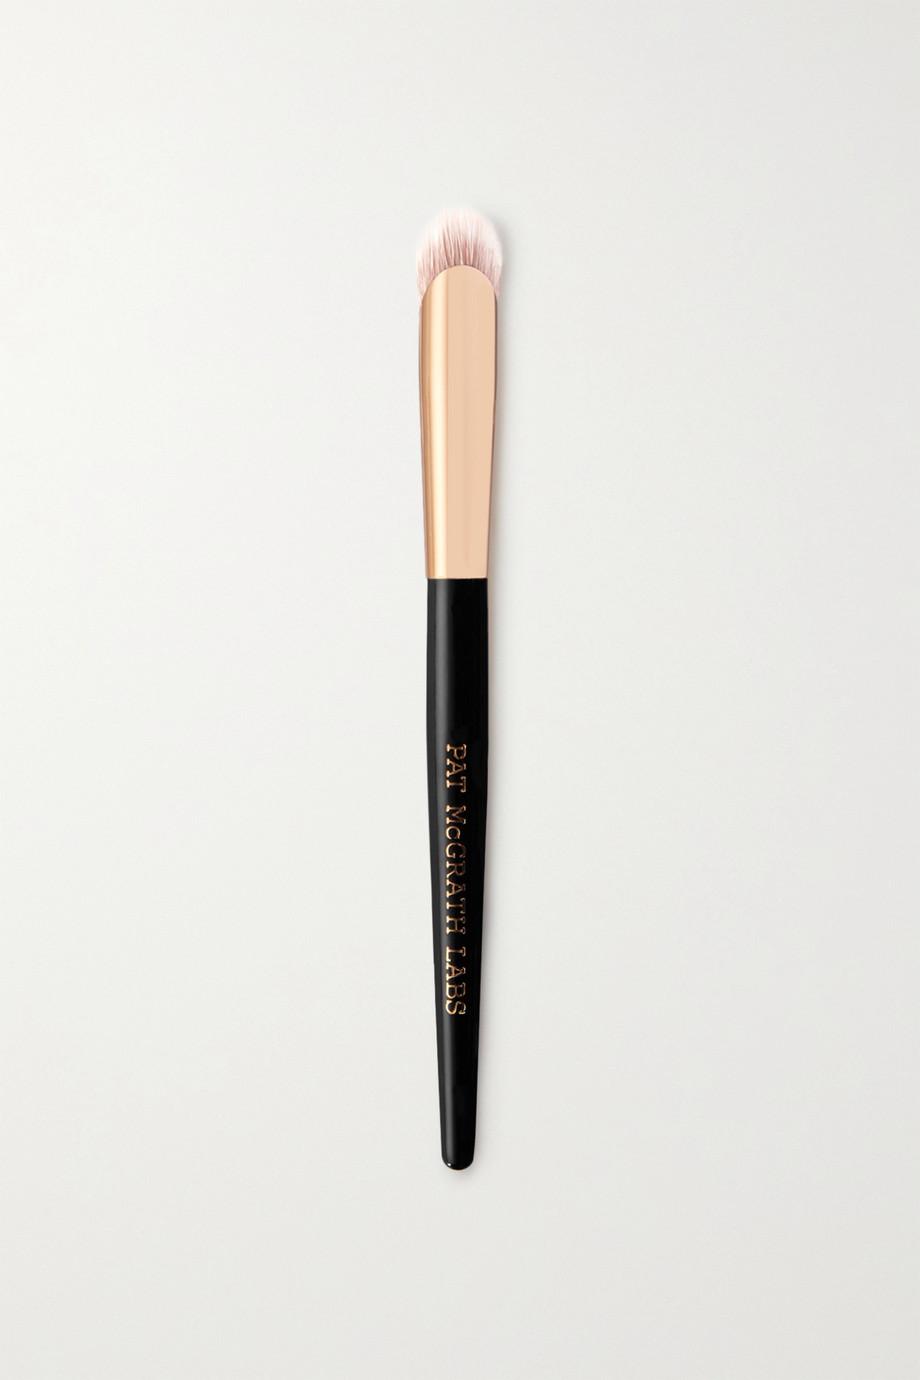 Pat McGrath Labs Skin Fetish: Sublime Perfection Concealer Brush